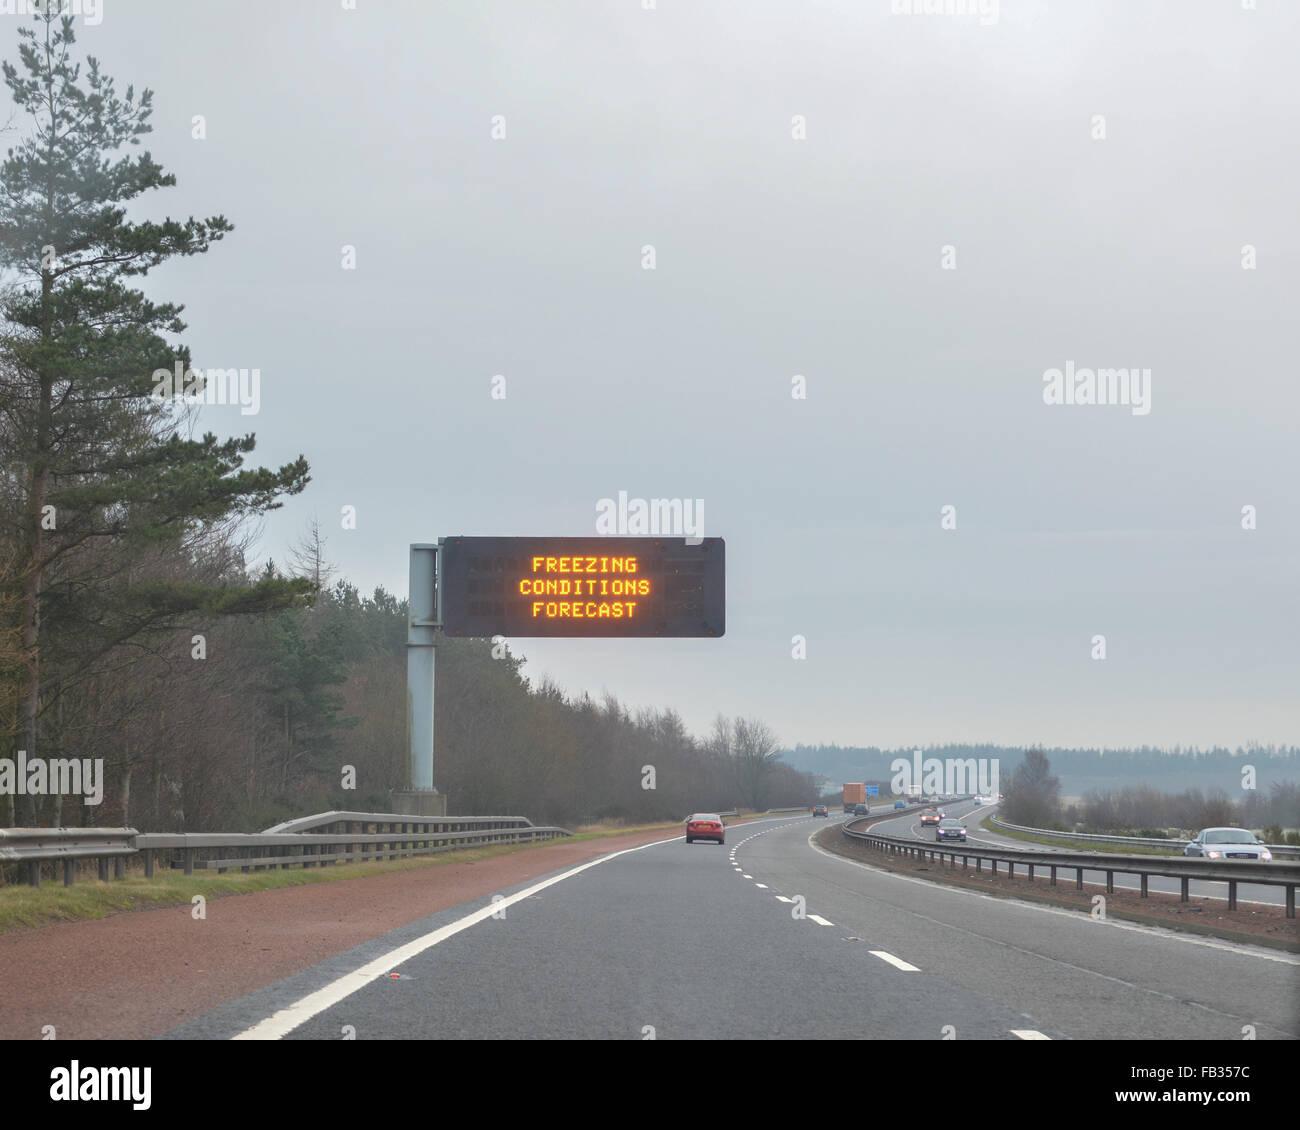 M9 motorway heading eastbound towards Edinburgh - 8 January 2016: UK weather - freezing conditions and snow forecast - Stock Image